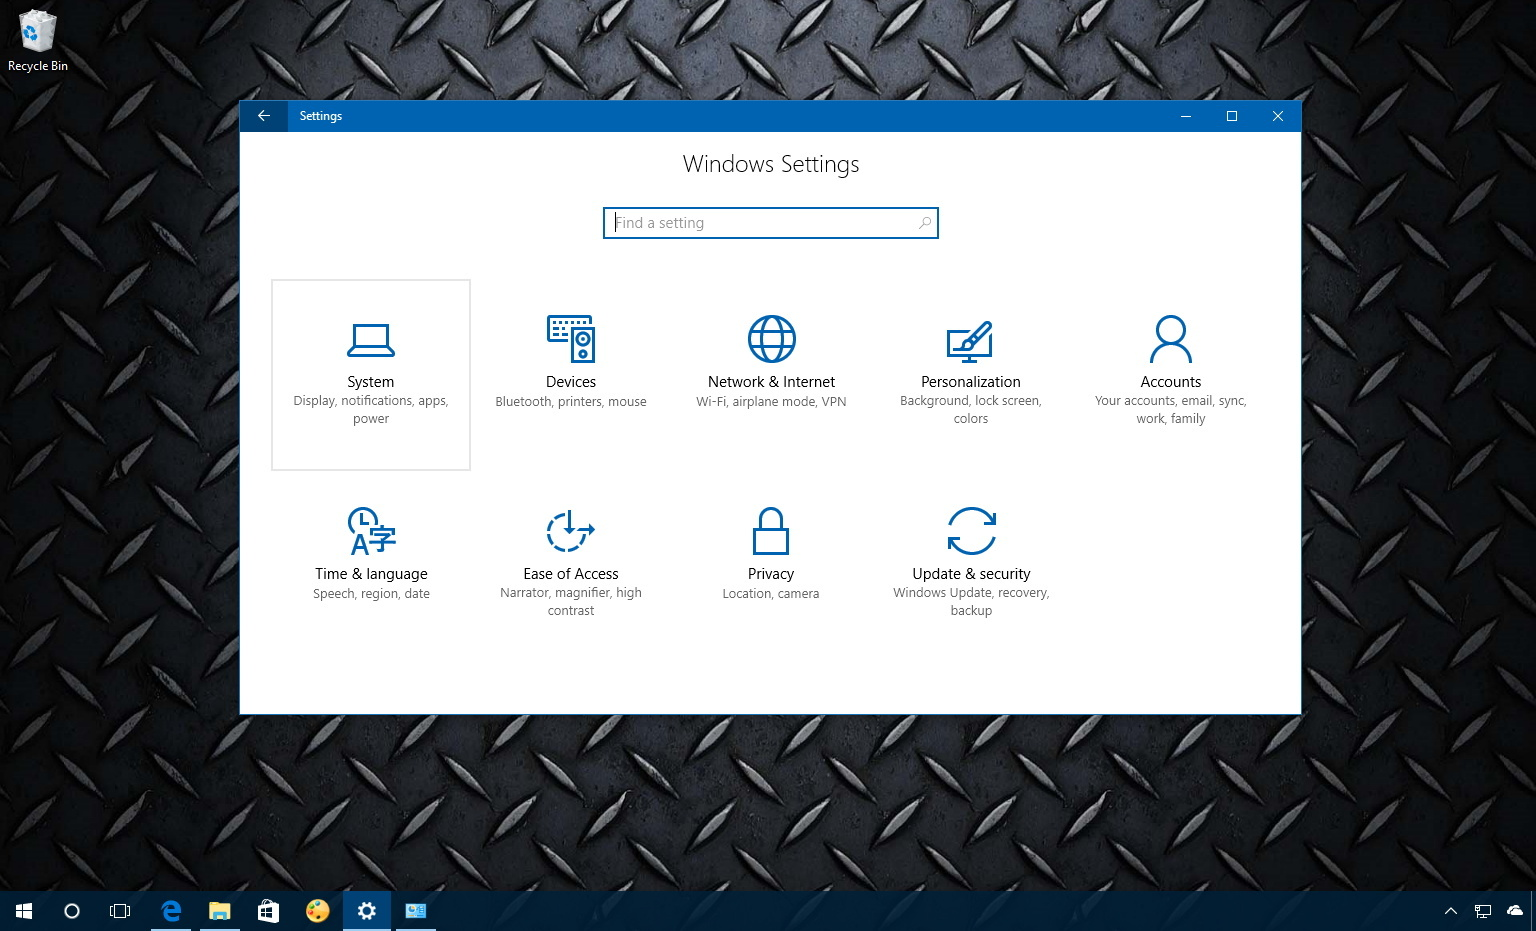 Windows 10 Settings, System